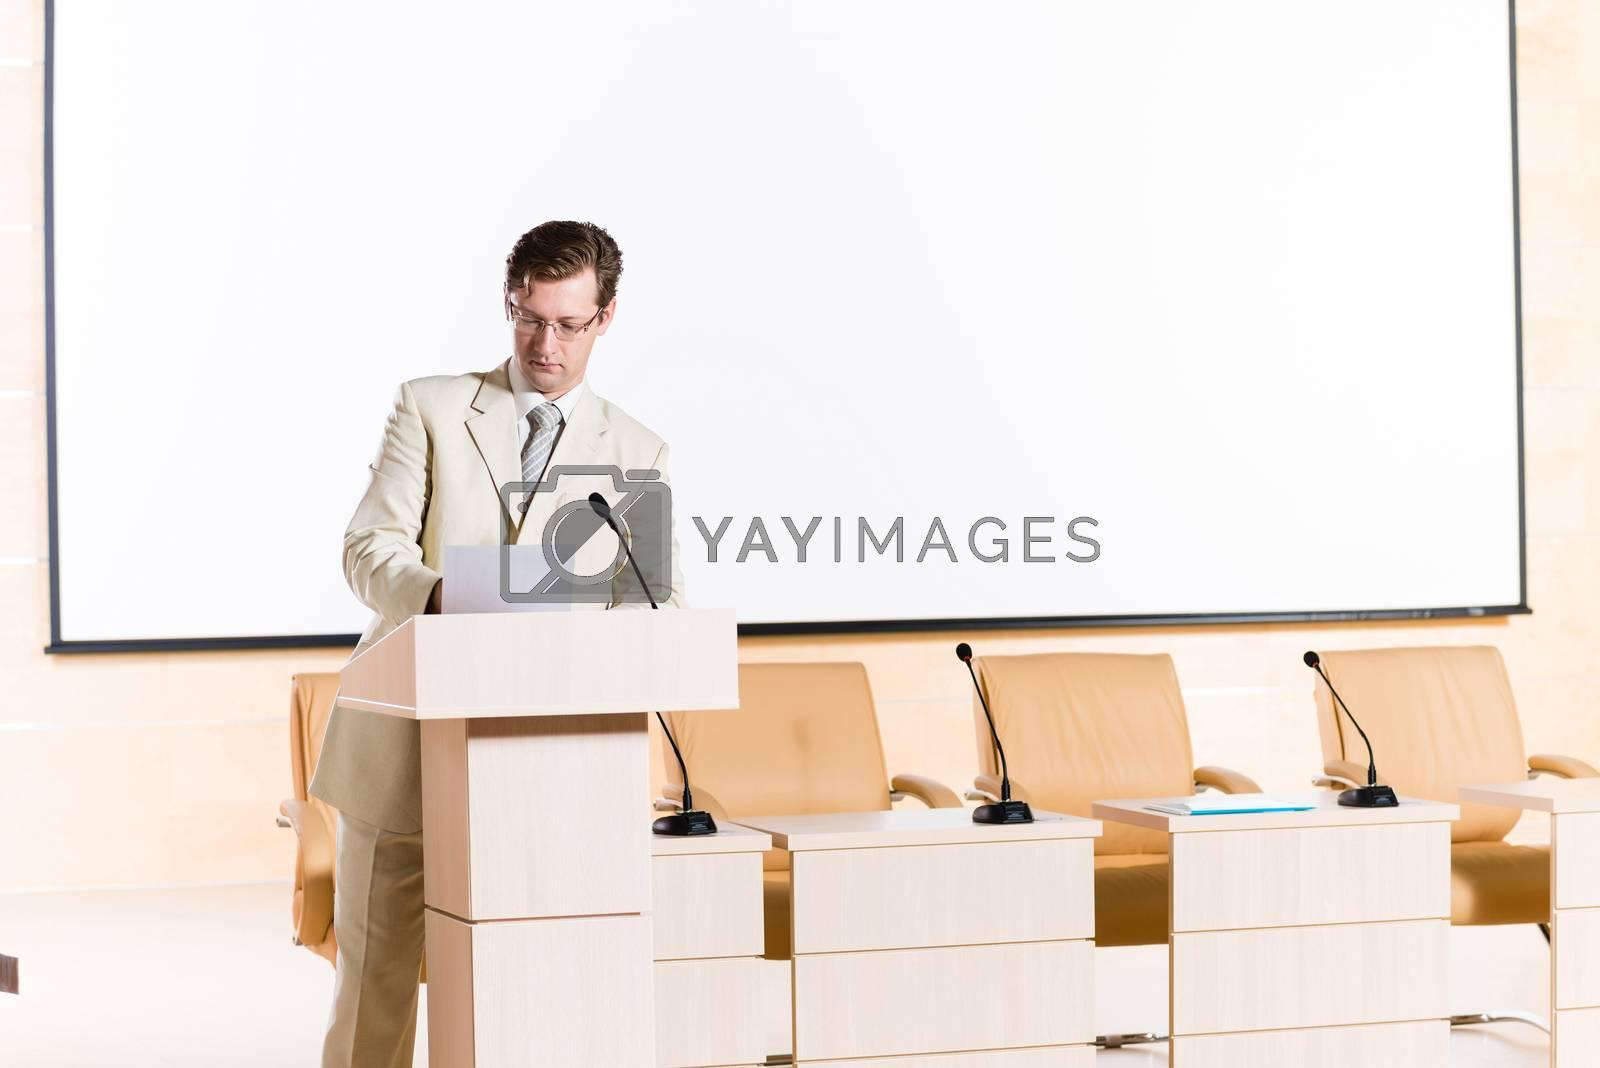 Royalty free image of male speaker by adam121